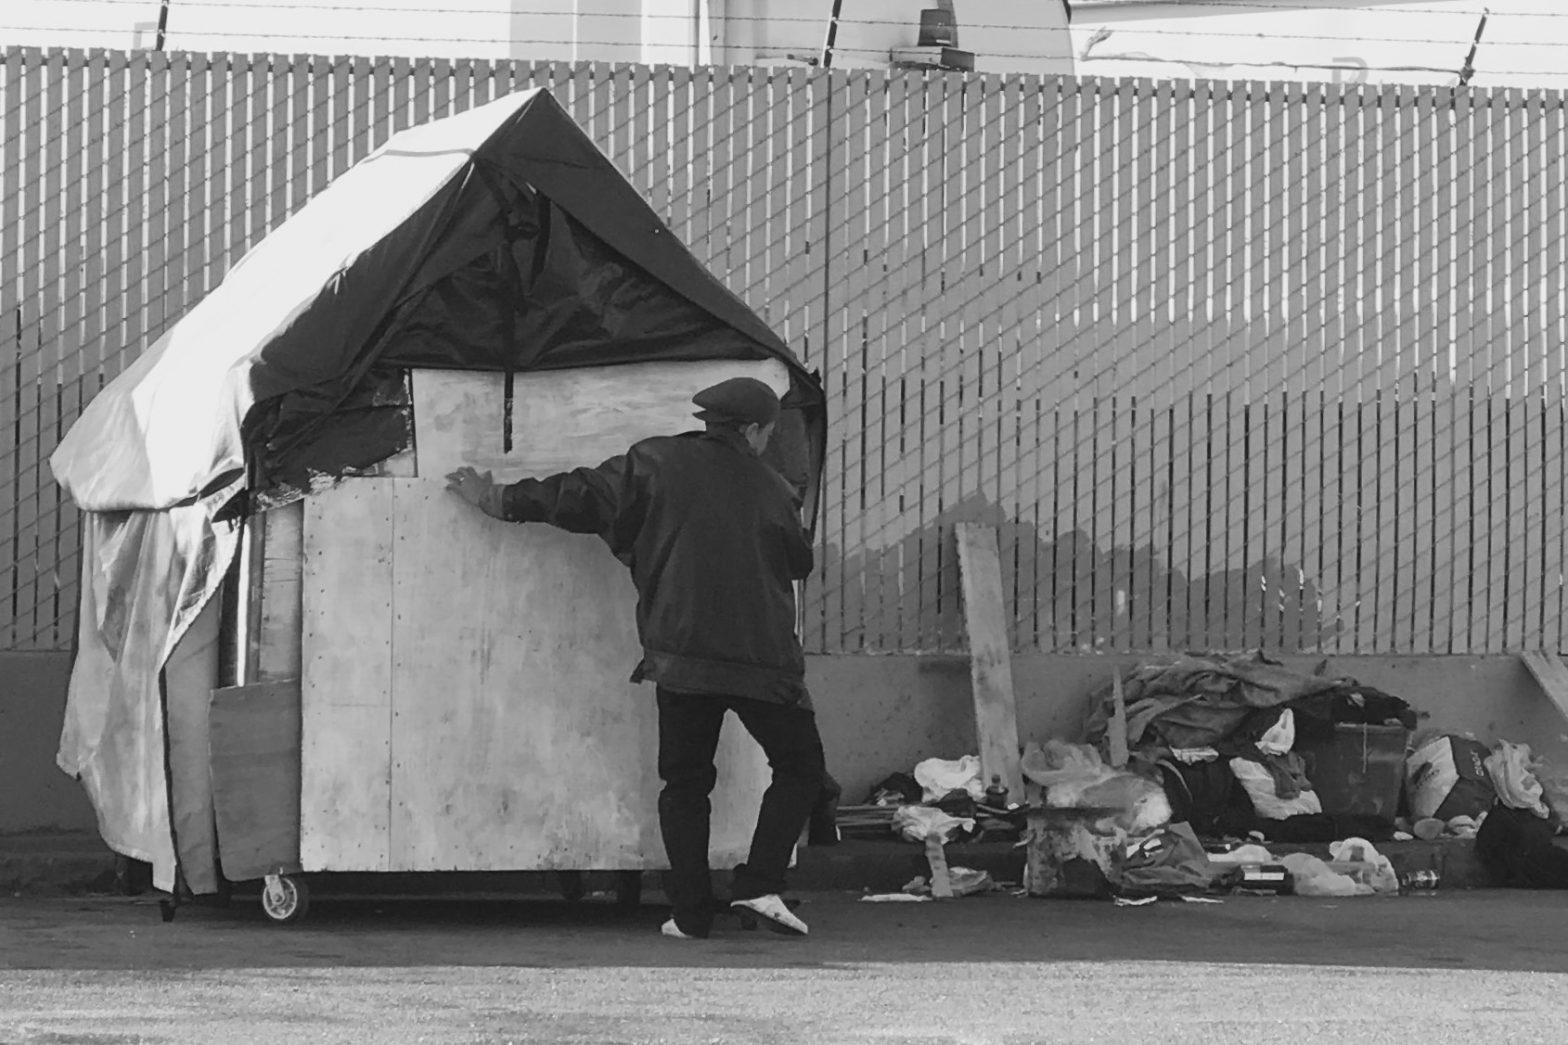 homeless_sf_2017-05_cropped.jpg